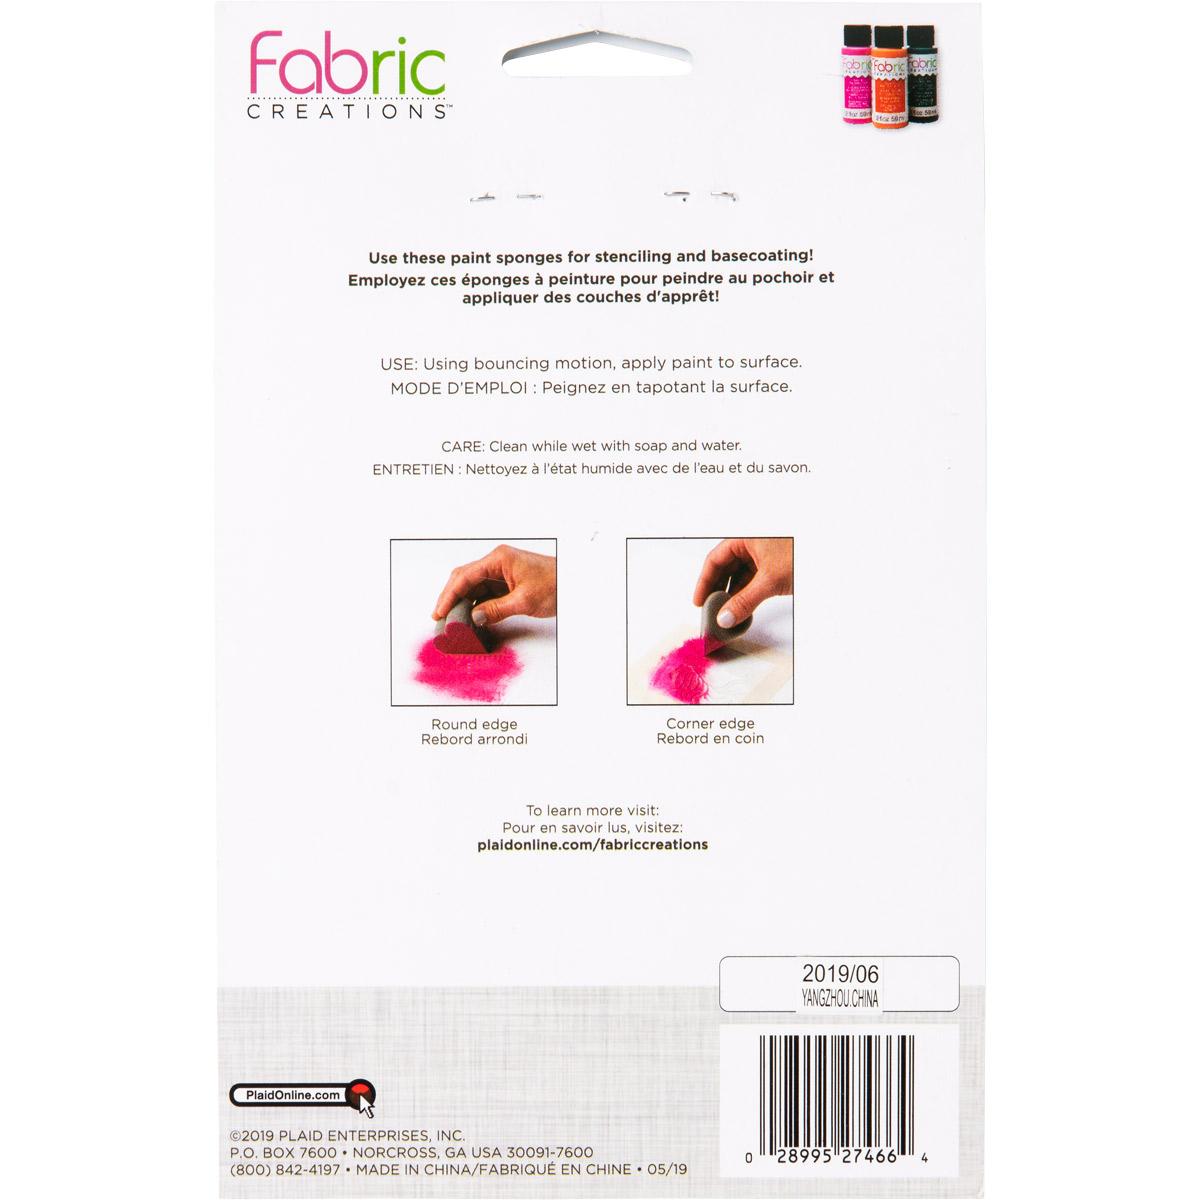 Fabric Creations™ Tools - Heart Shaped Sponge Applicators, 6 pc.